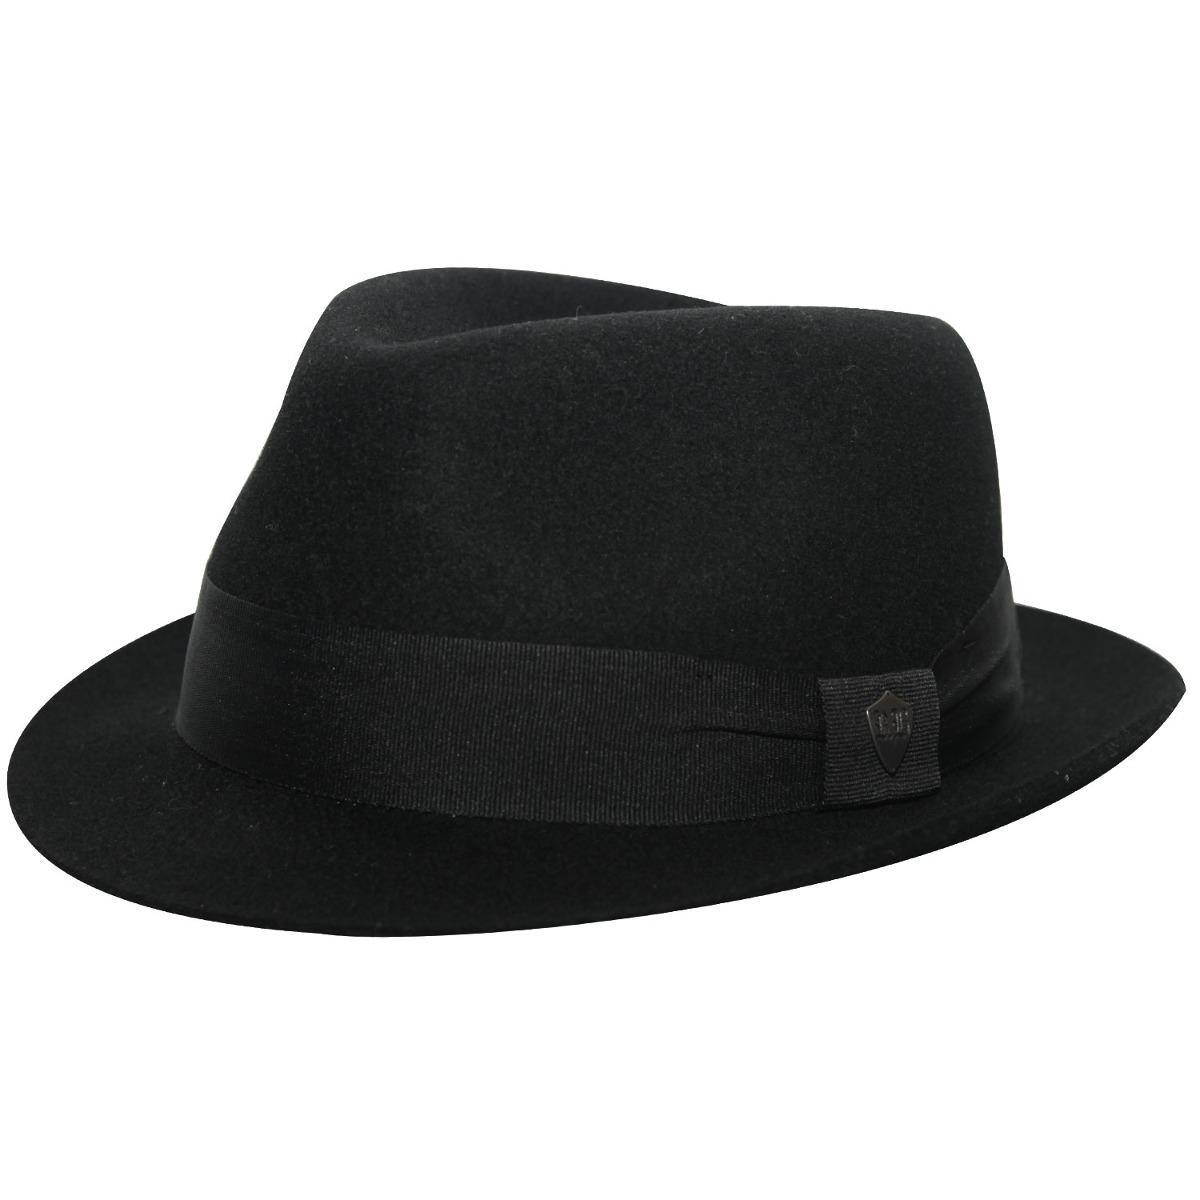 chapéu fedora aba curta preto masculino. Carregando zoom. 4153ade00d0